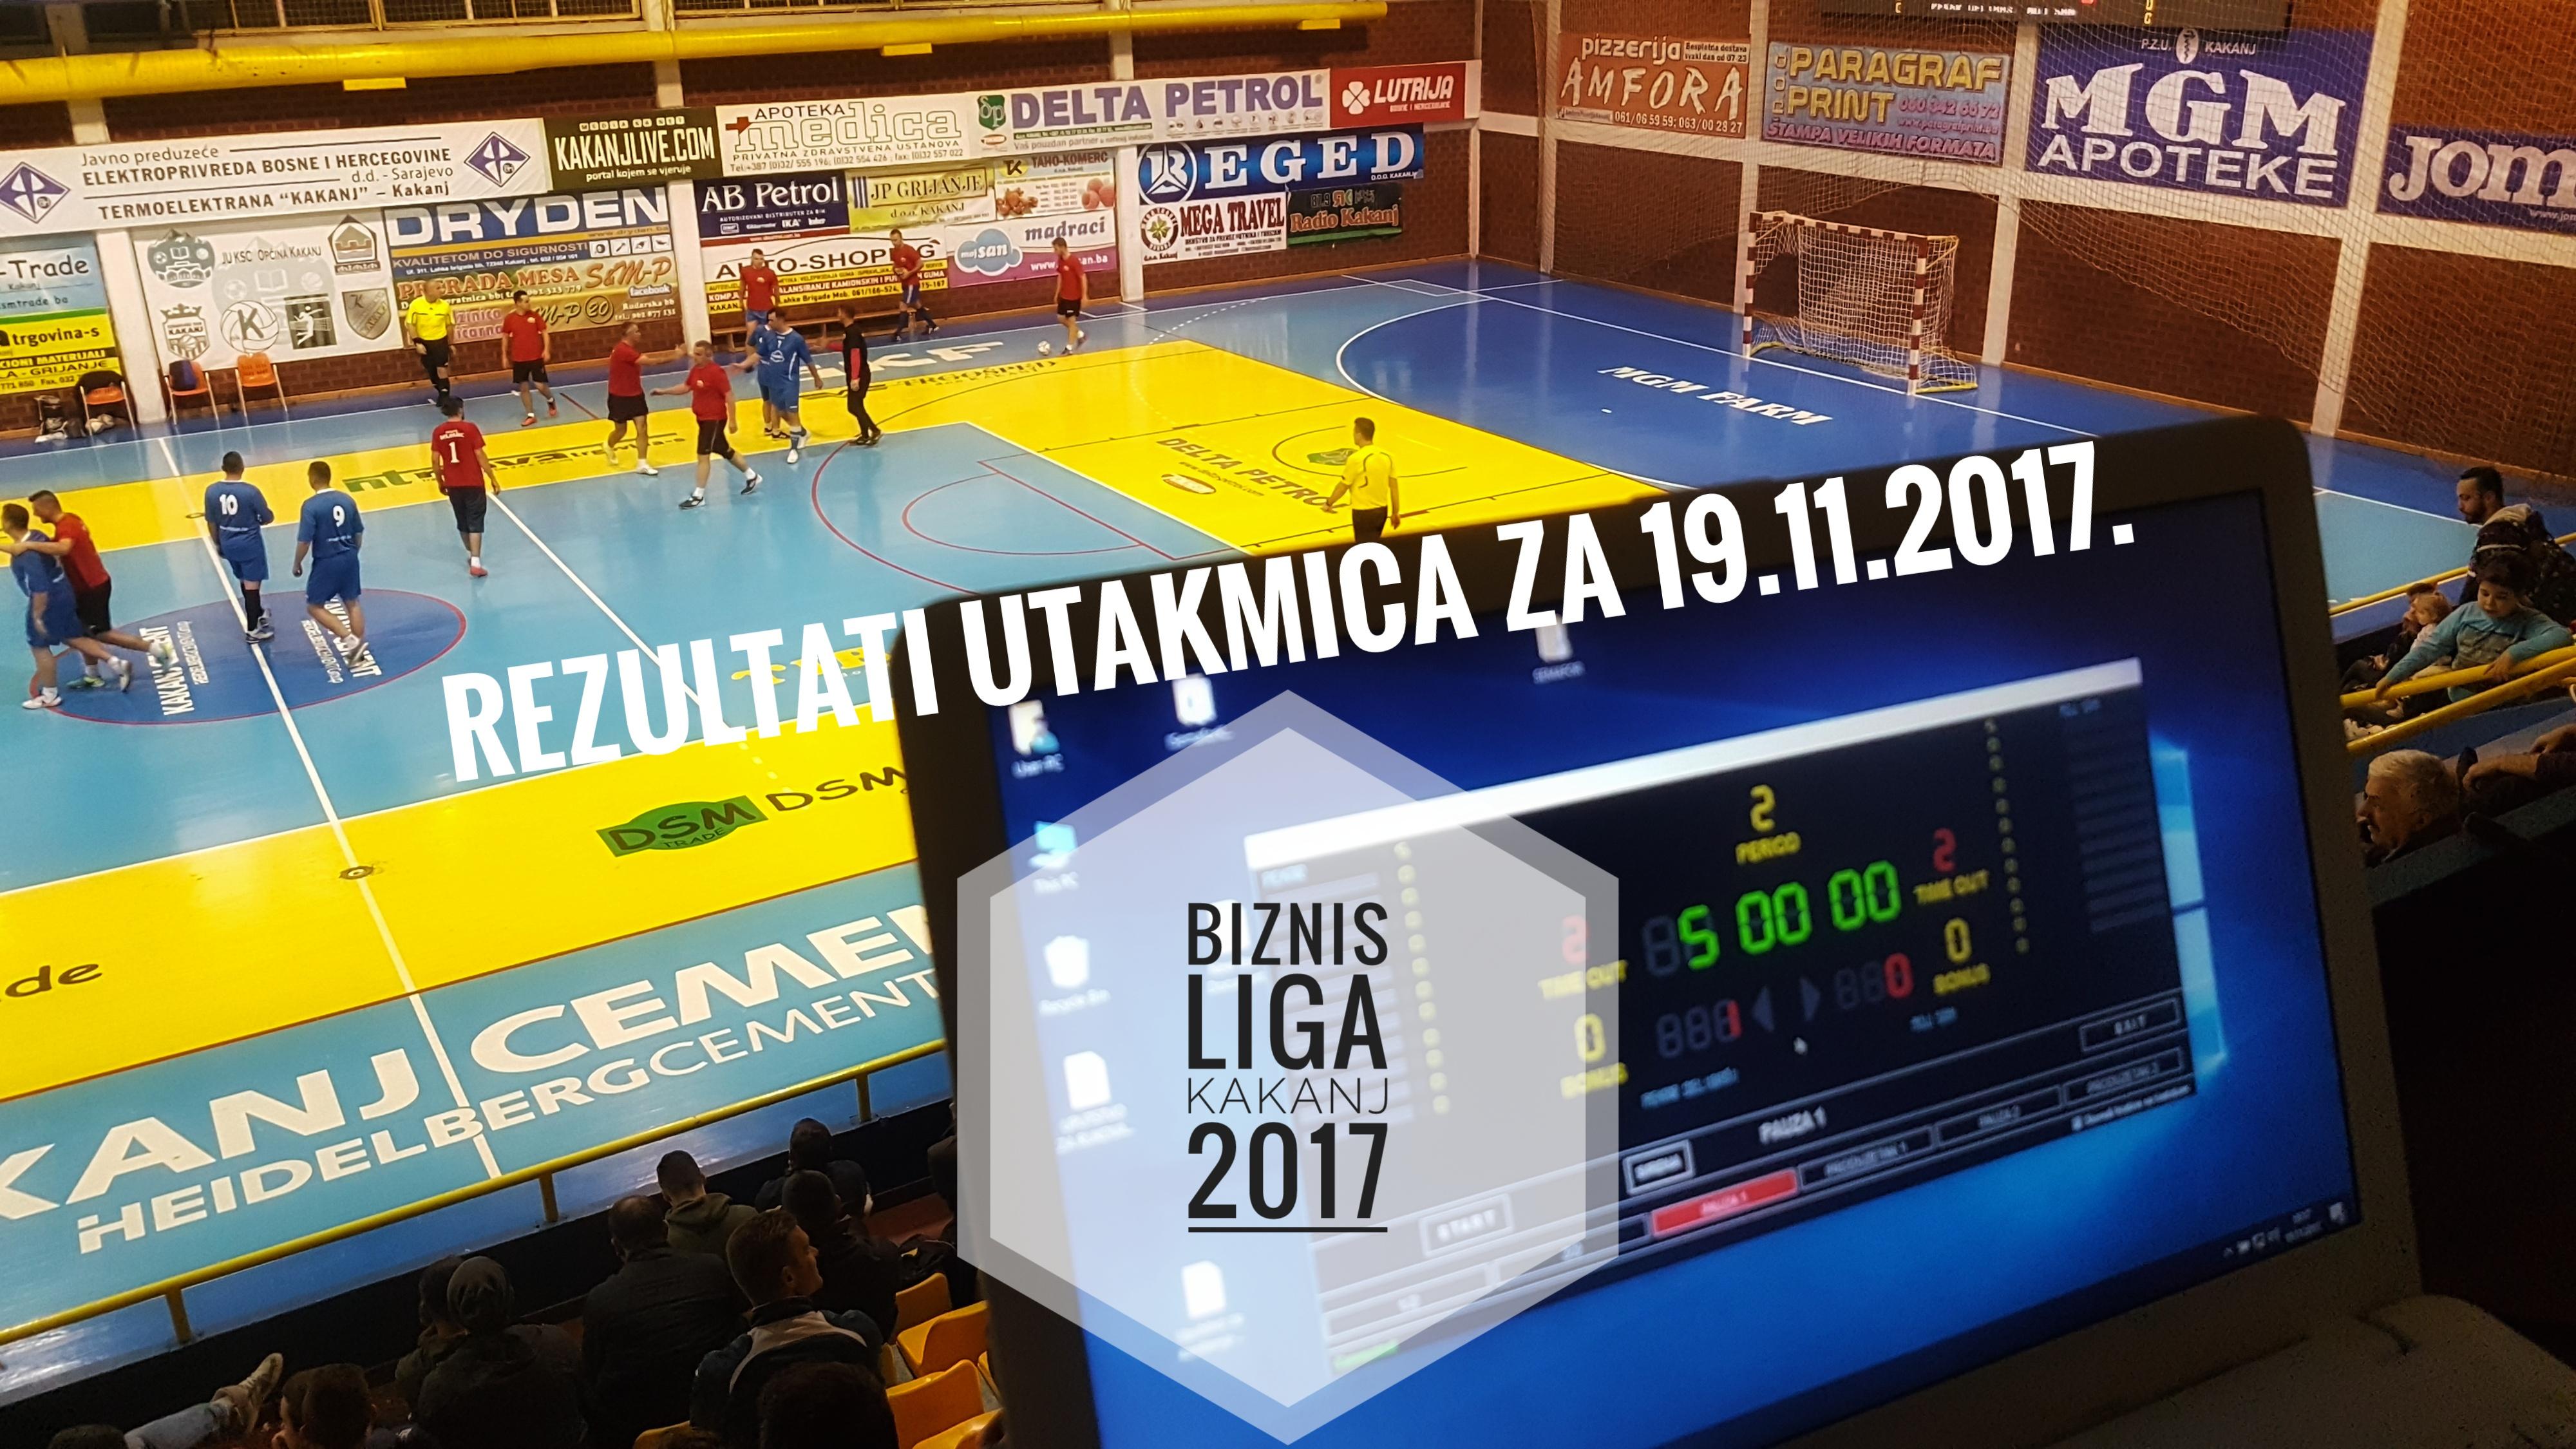 "Biznis liga ""Kakanj 2017"": Večeras se u četvrtfinale plasirale ekipe Elektrodistribucija, Pekar Delibašić, DSM Trade d.o.o i Općina Kakanj"